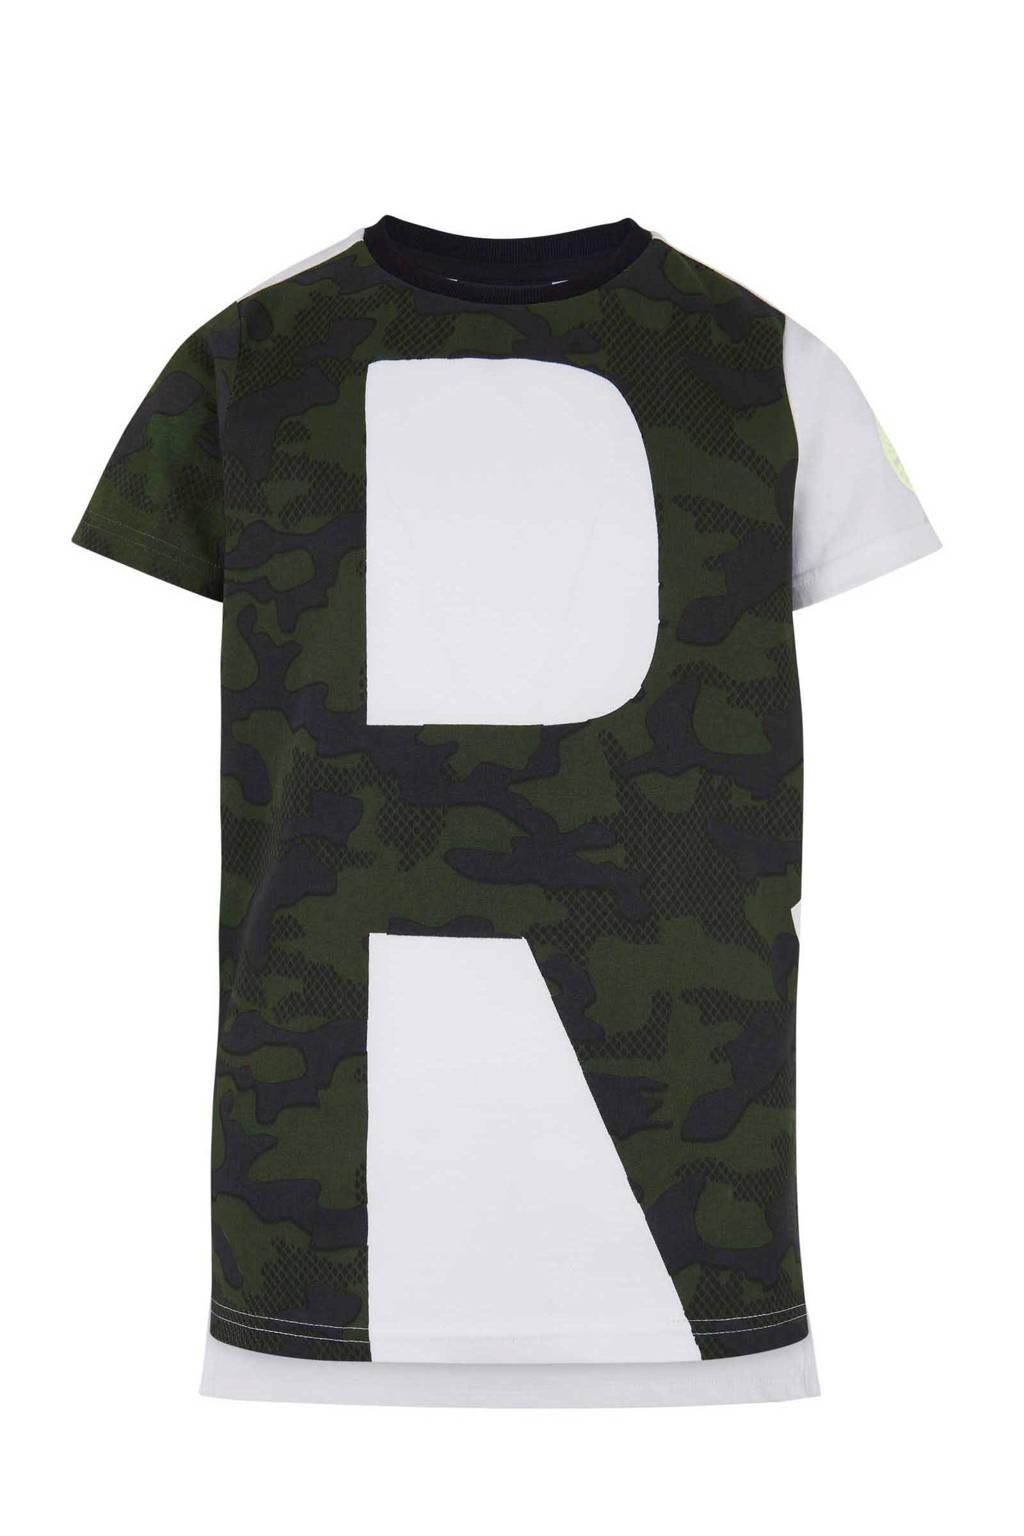 Retour Denim T-shirt Josh met camouflageprint wit, Wit/Legergroen